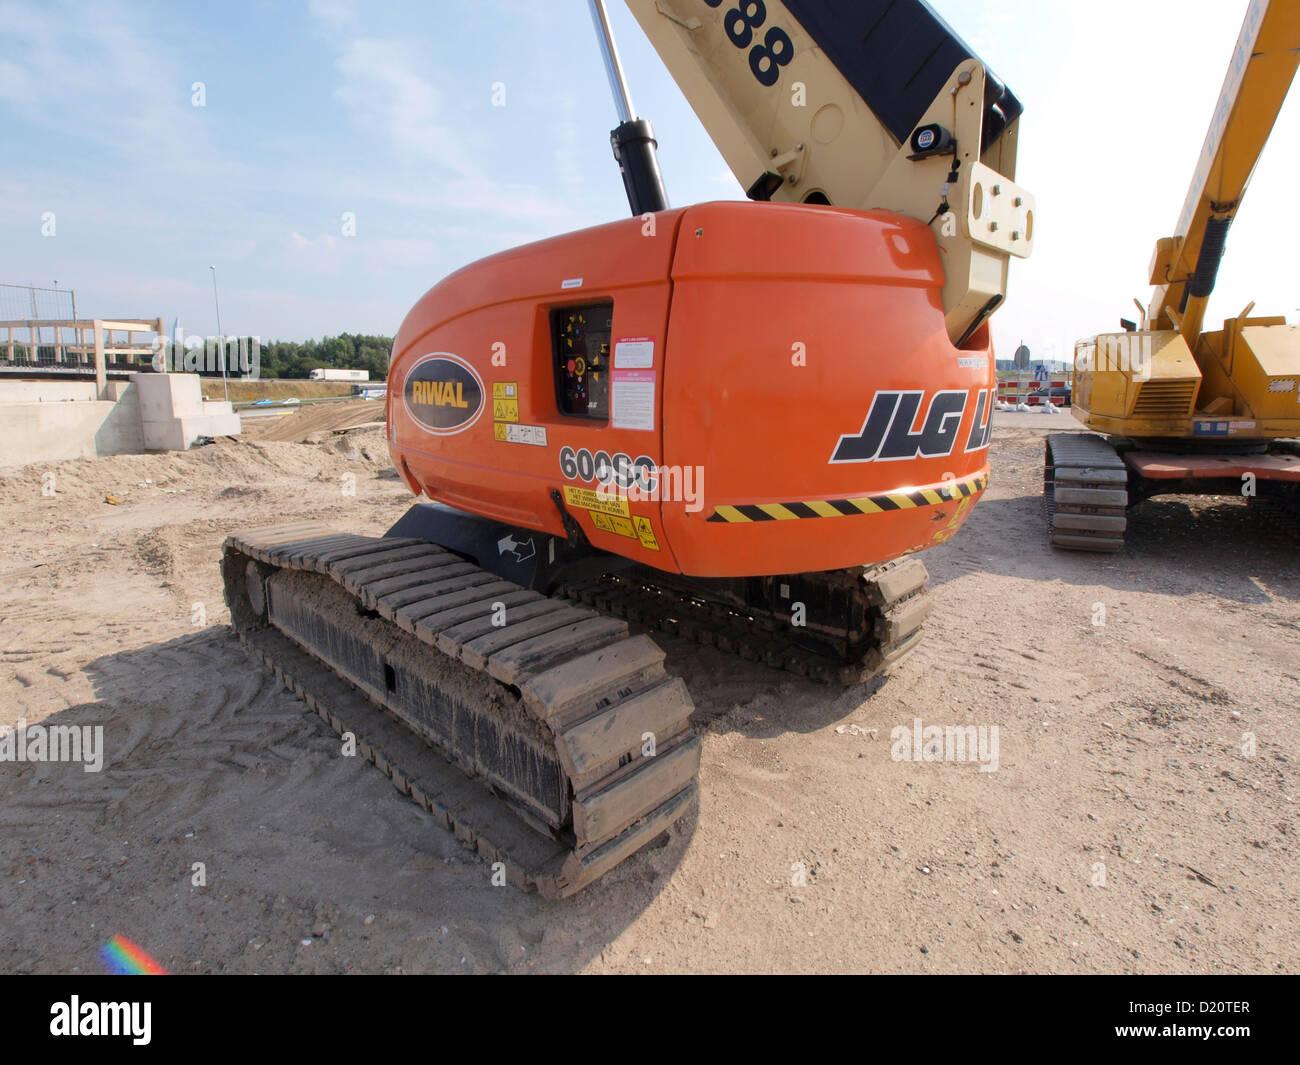 JLG 600SC Telescopic Crawler Boom Lift Stock Photo: 52879647